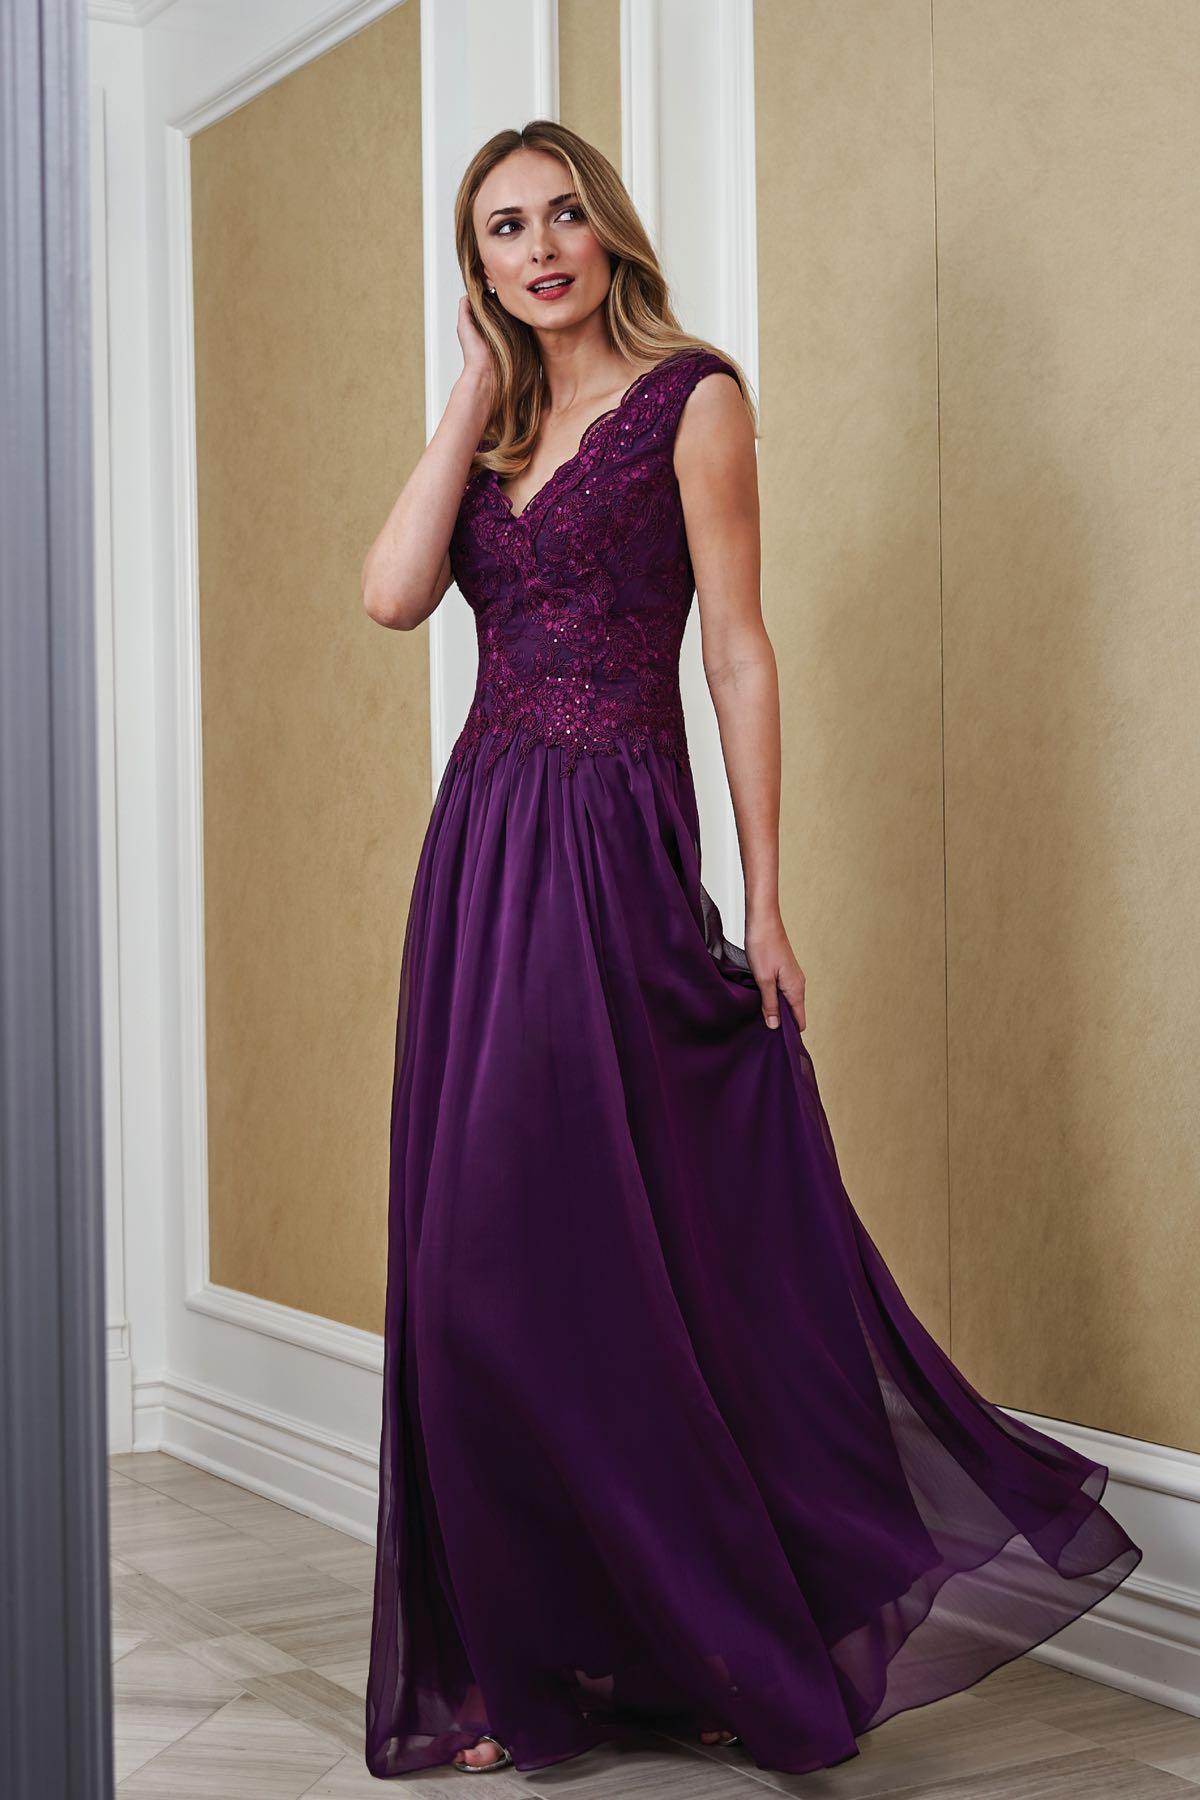 90b78fcec13 J215064 Alice Lace   Jade Tiffany Chiffon MOB Dress with V-neckline